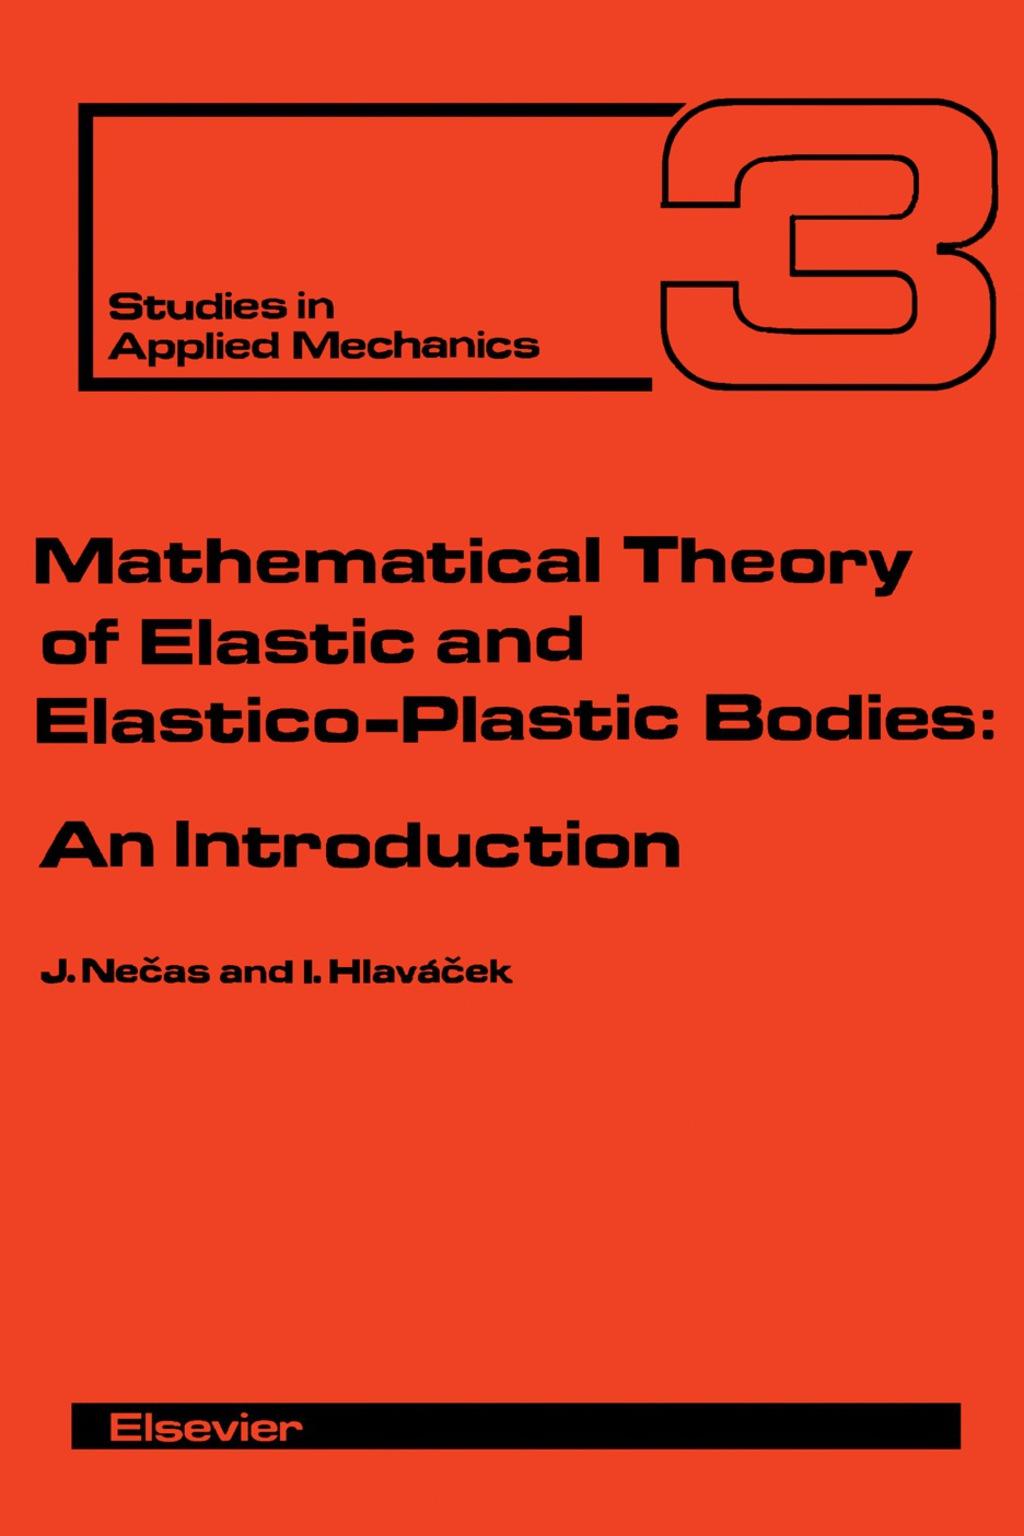 Mathematical Theory of Elastic and Elasto-Plastic Bodies (eBook)